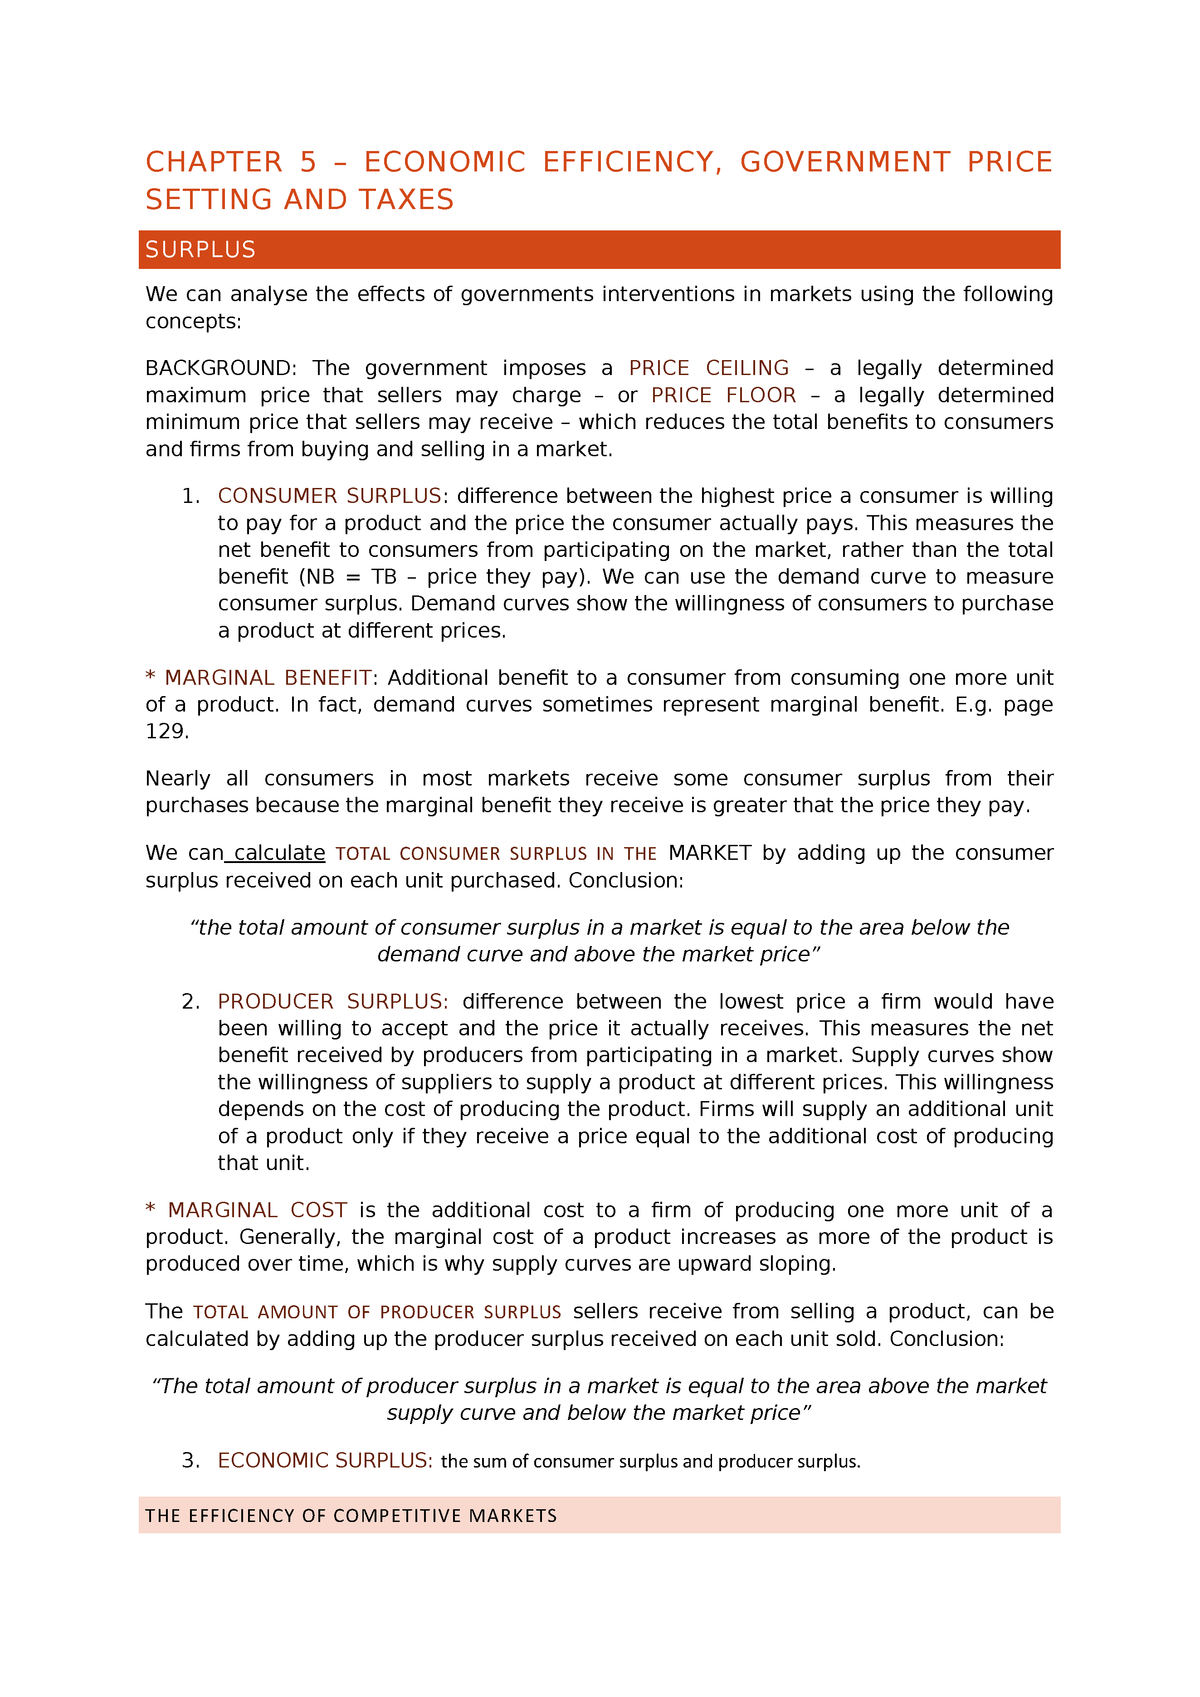 Chapter 5 - Summary Essentials of Economics - 6355 - StuDocu